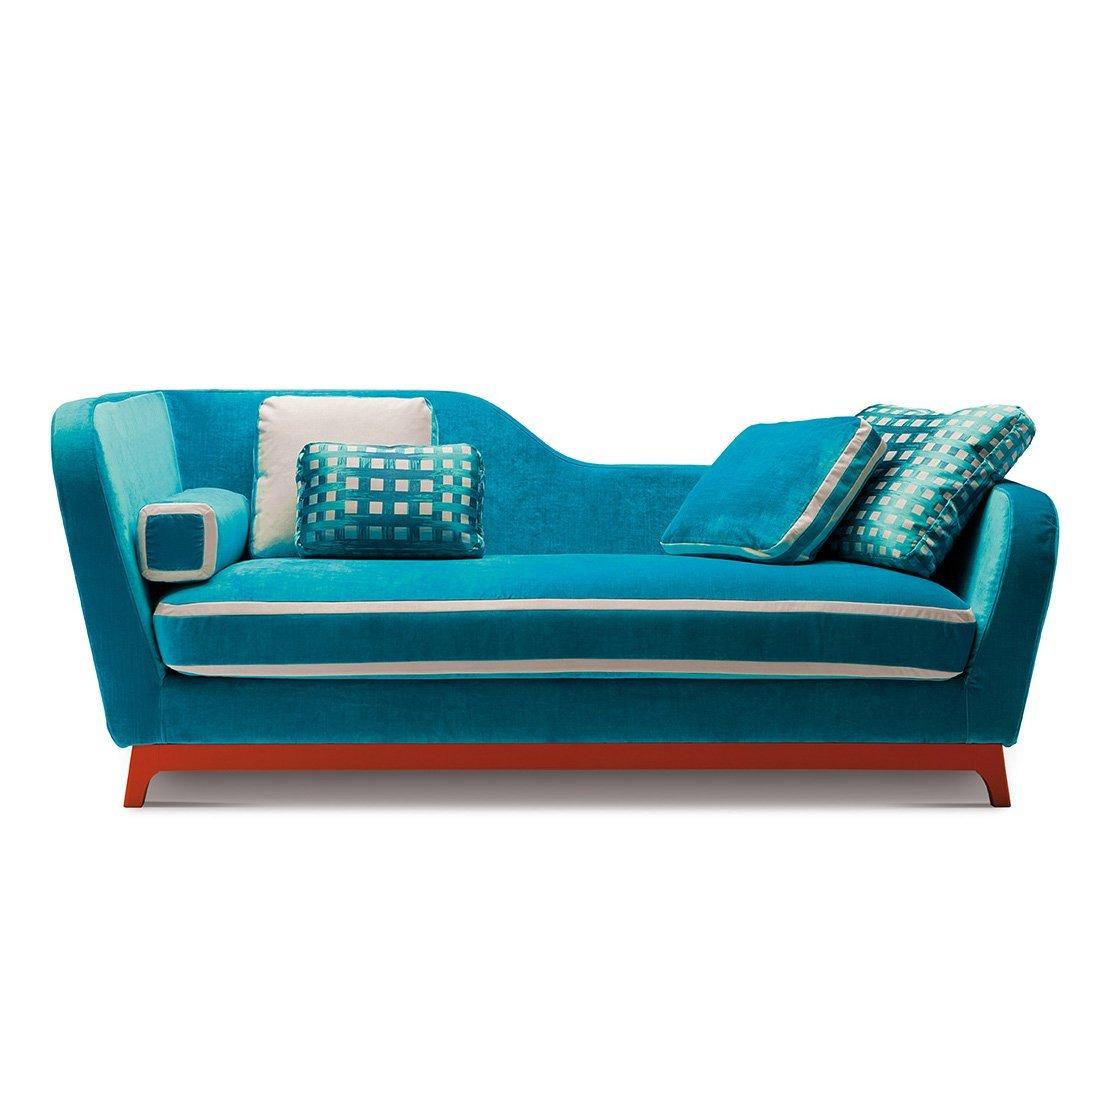 canap convertible design milano bedding jeremie trendy. Black Bedroom Furniture Sets. Home Design Ideas